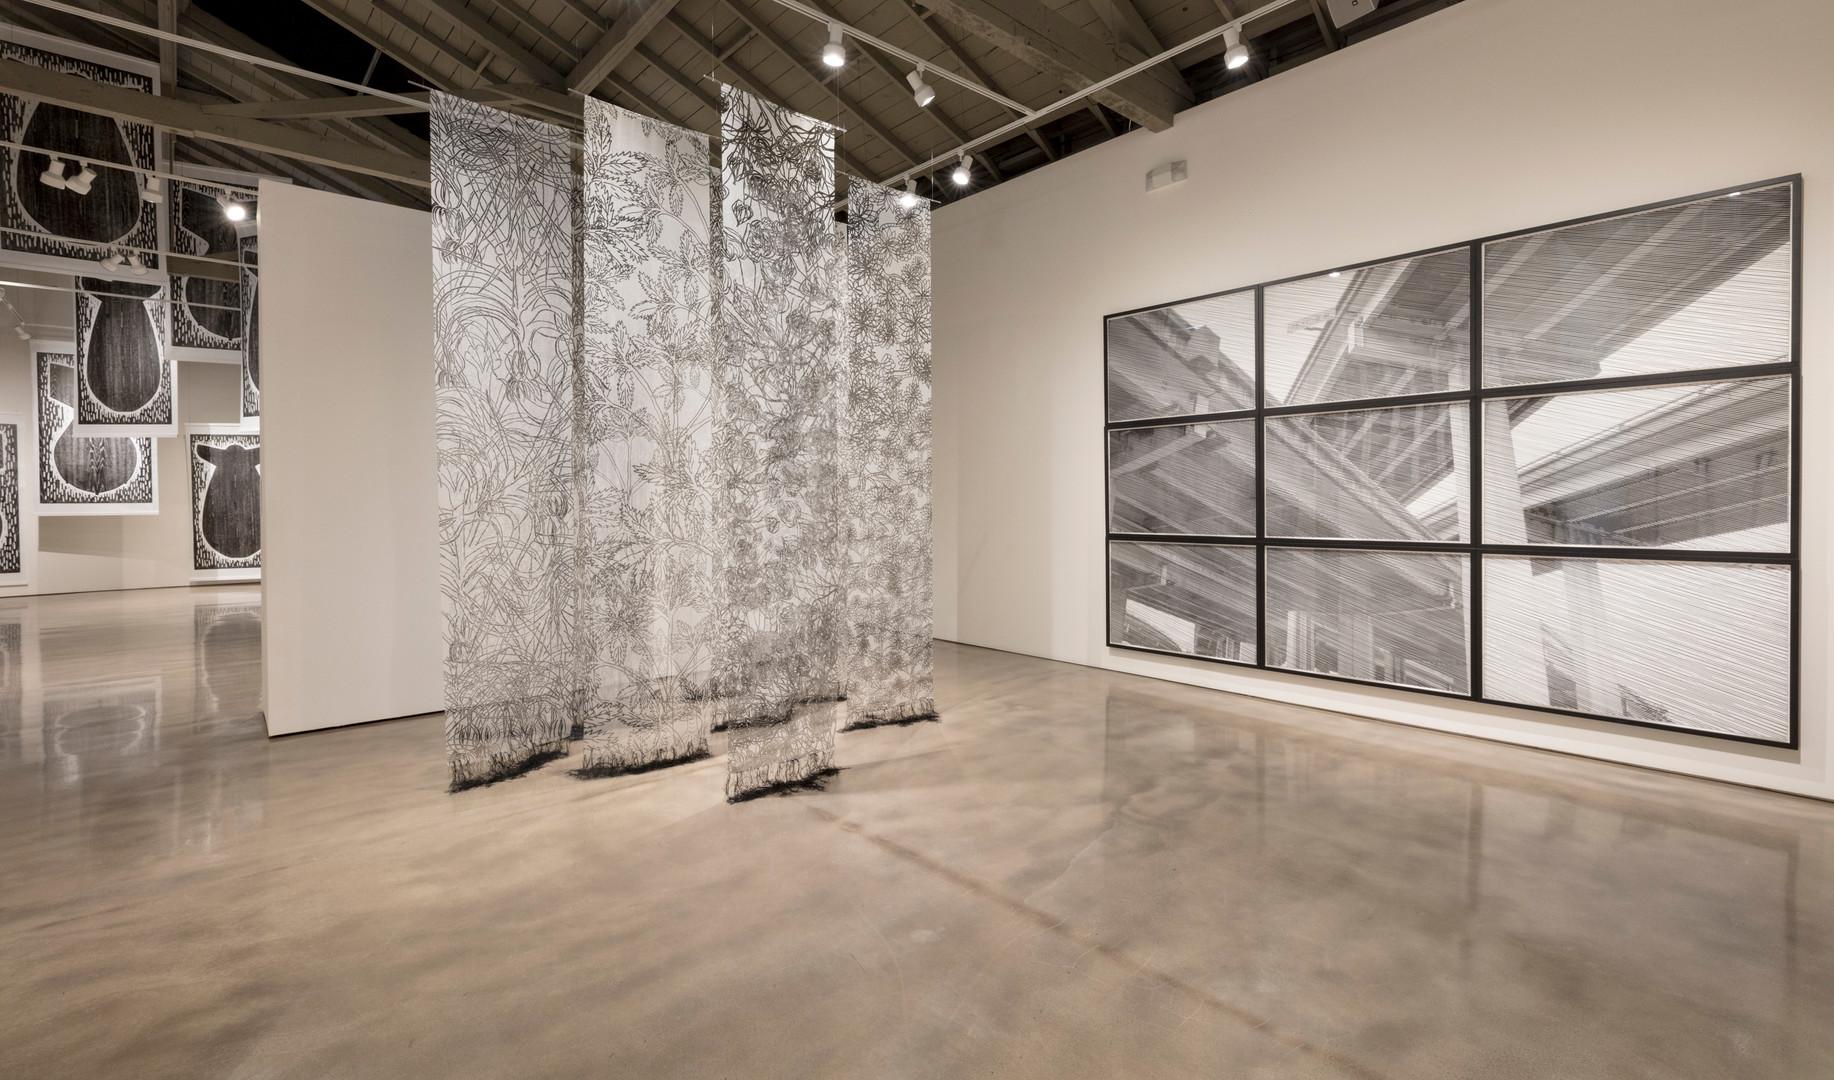 Exhibition: Printstallations at San Jose Institute of Contemporary Art